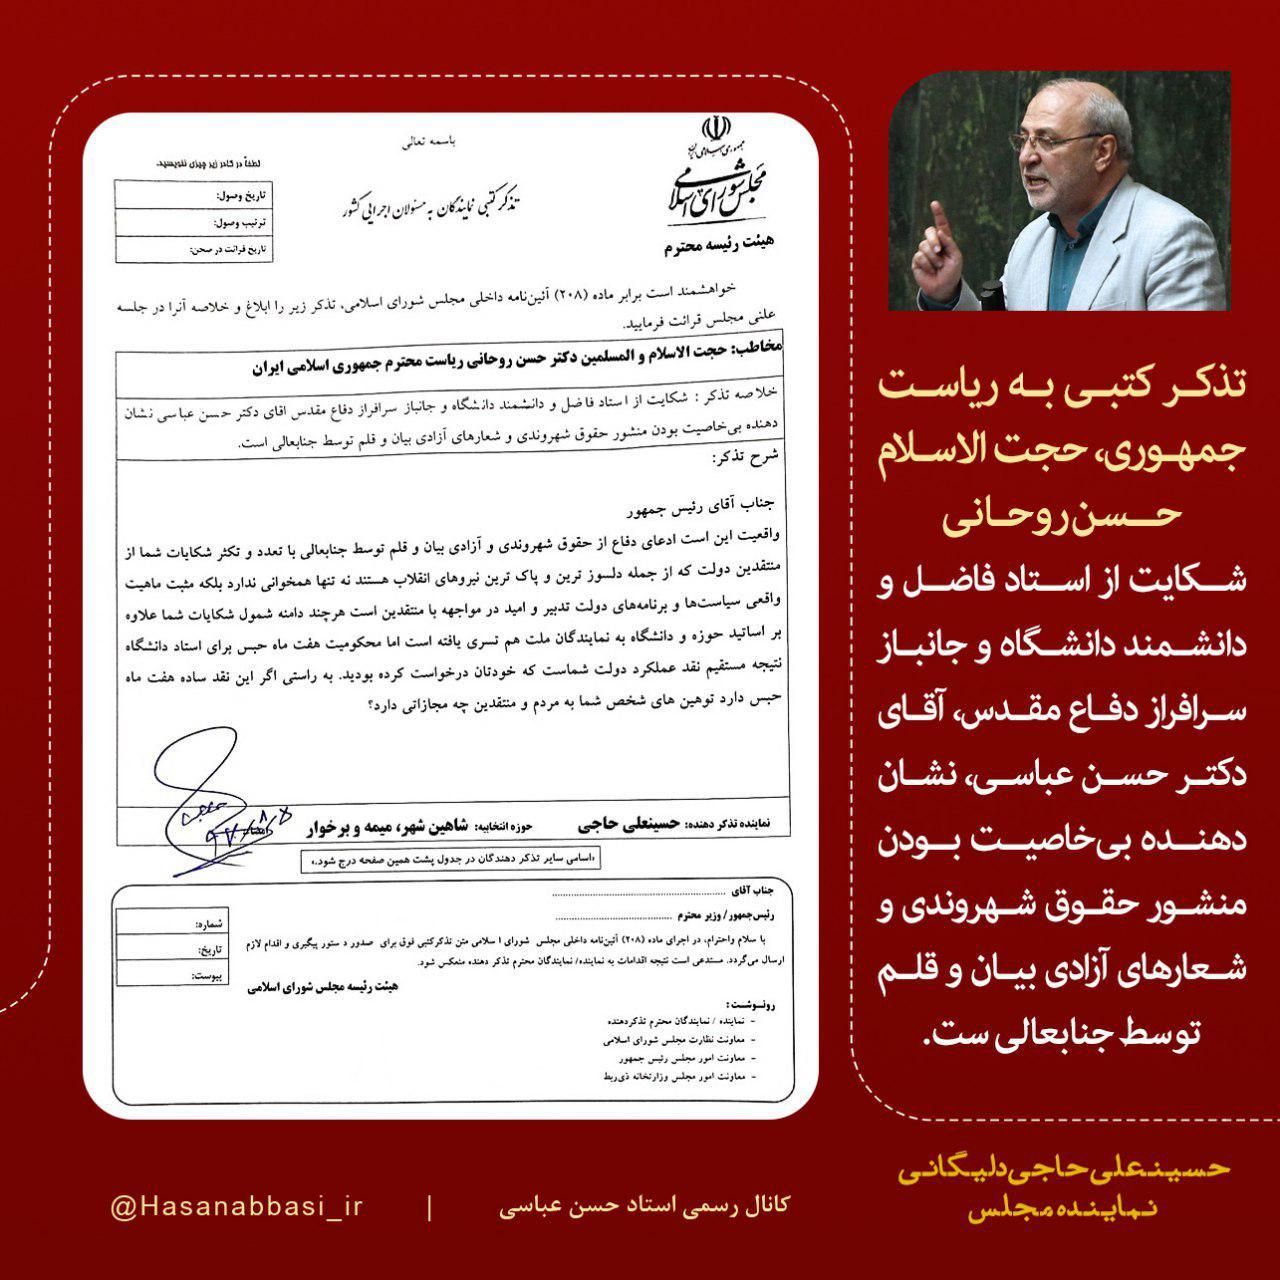 photo 07 45 مواضع جمعی از اهالی هنر و همچنين رسانه انقلاب در خصوص حکم حبس استاد حسن عباسی